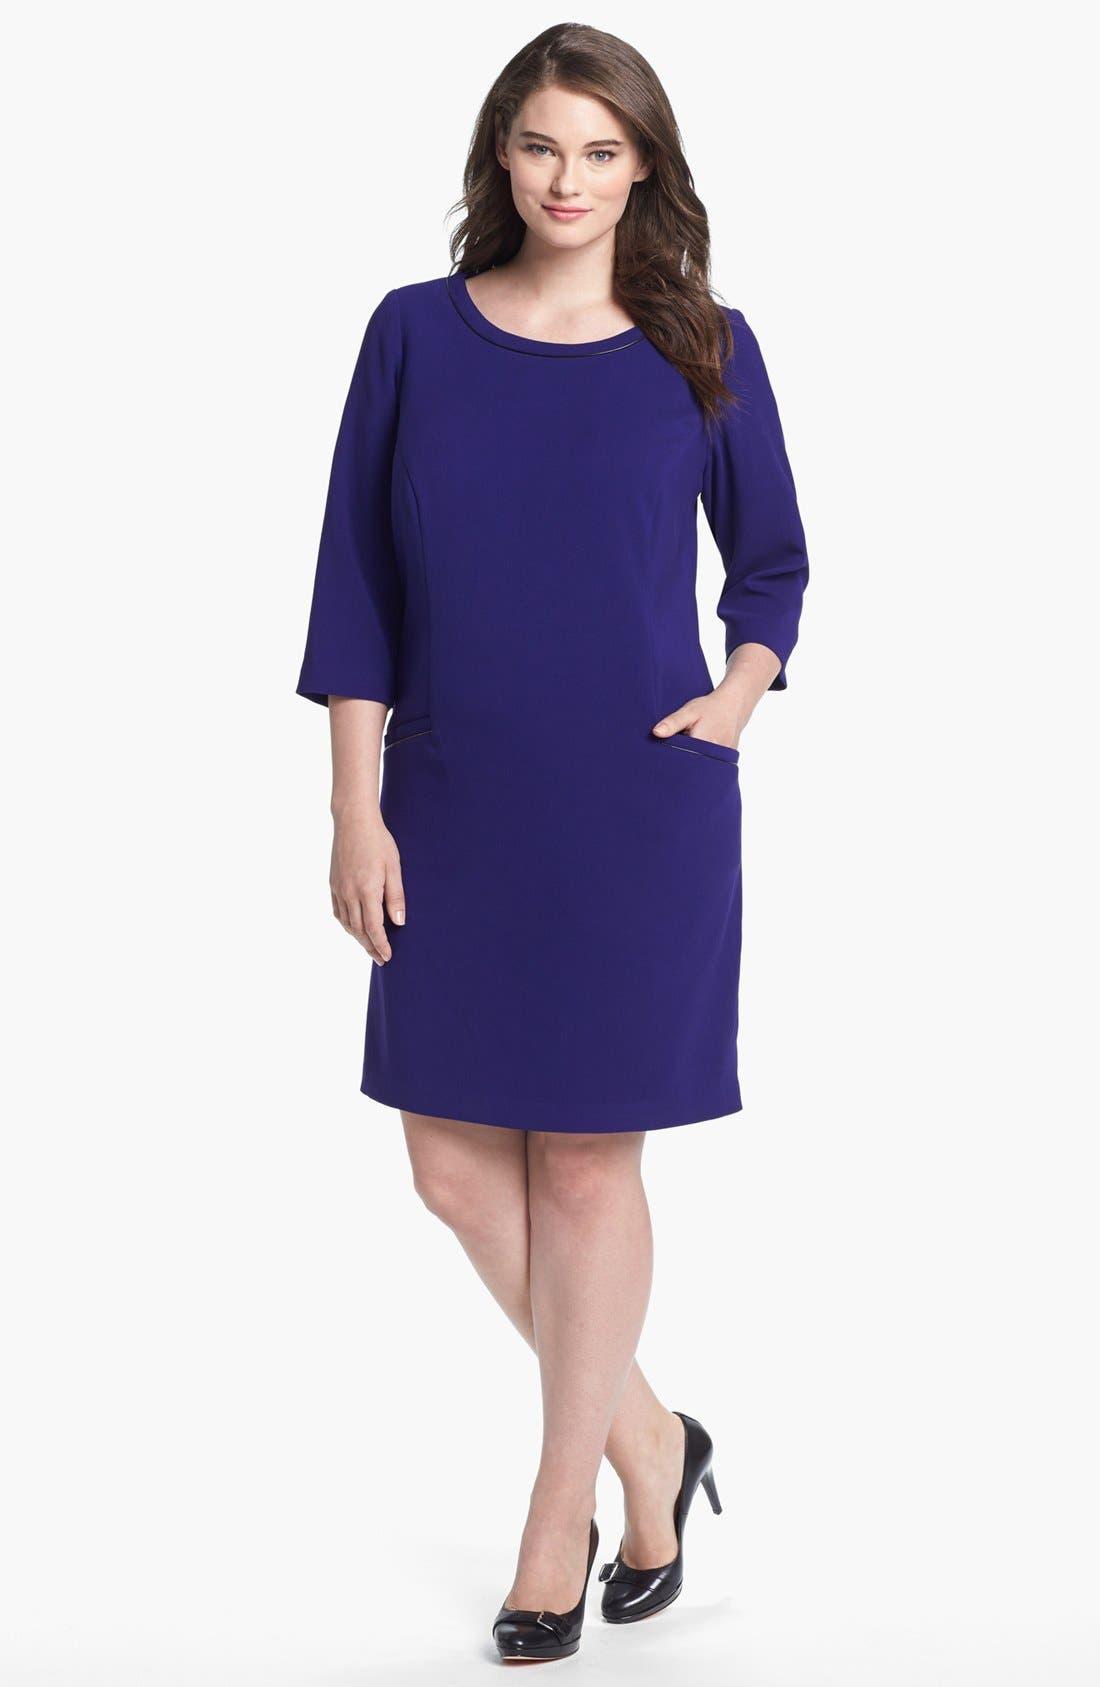 Alternate Image 1 Selected - Eliza J Faux Leather Trim Shift Dress (Plus Size)